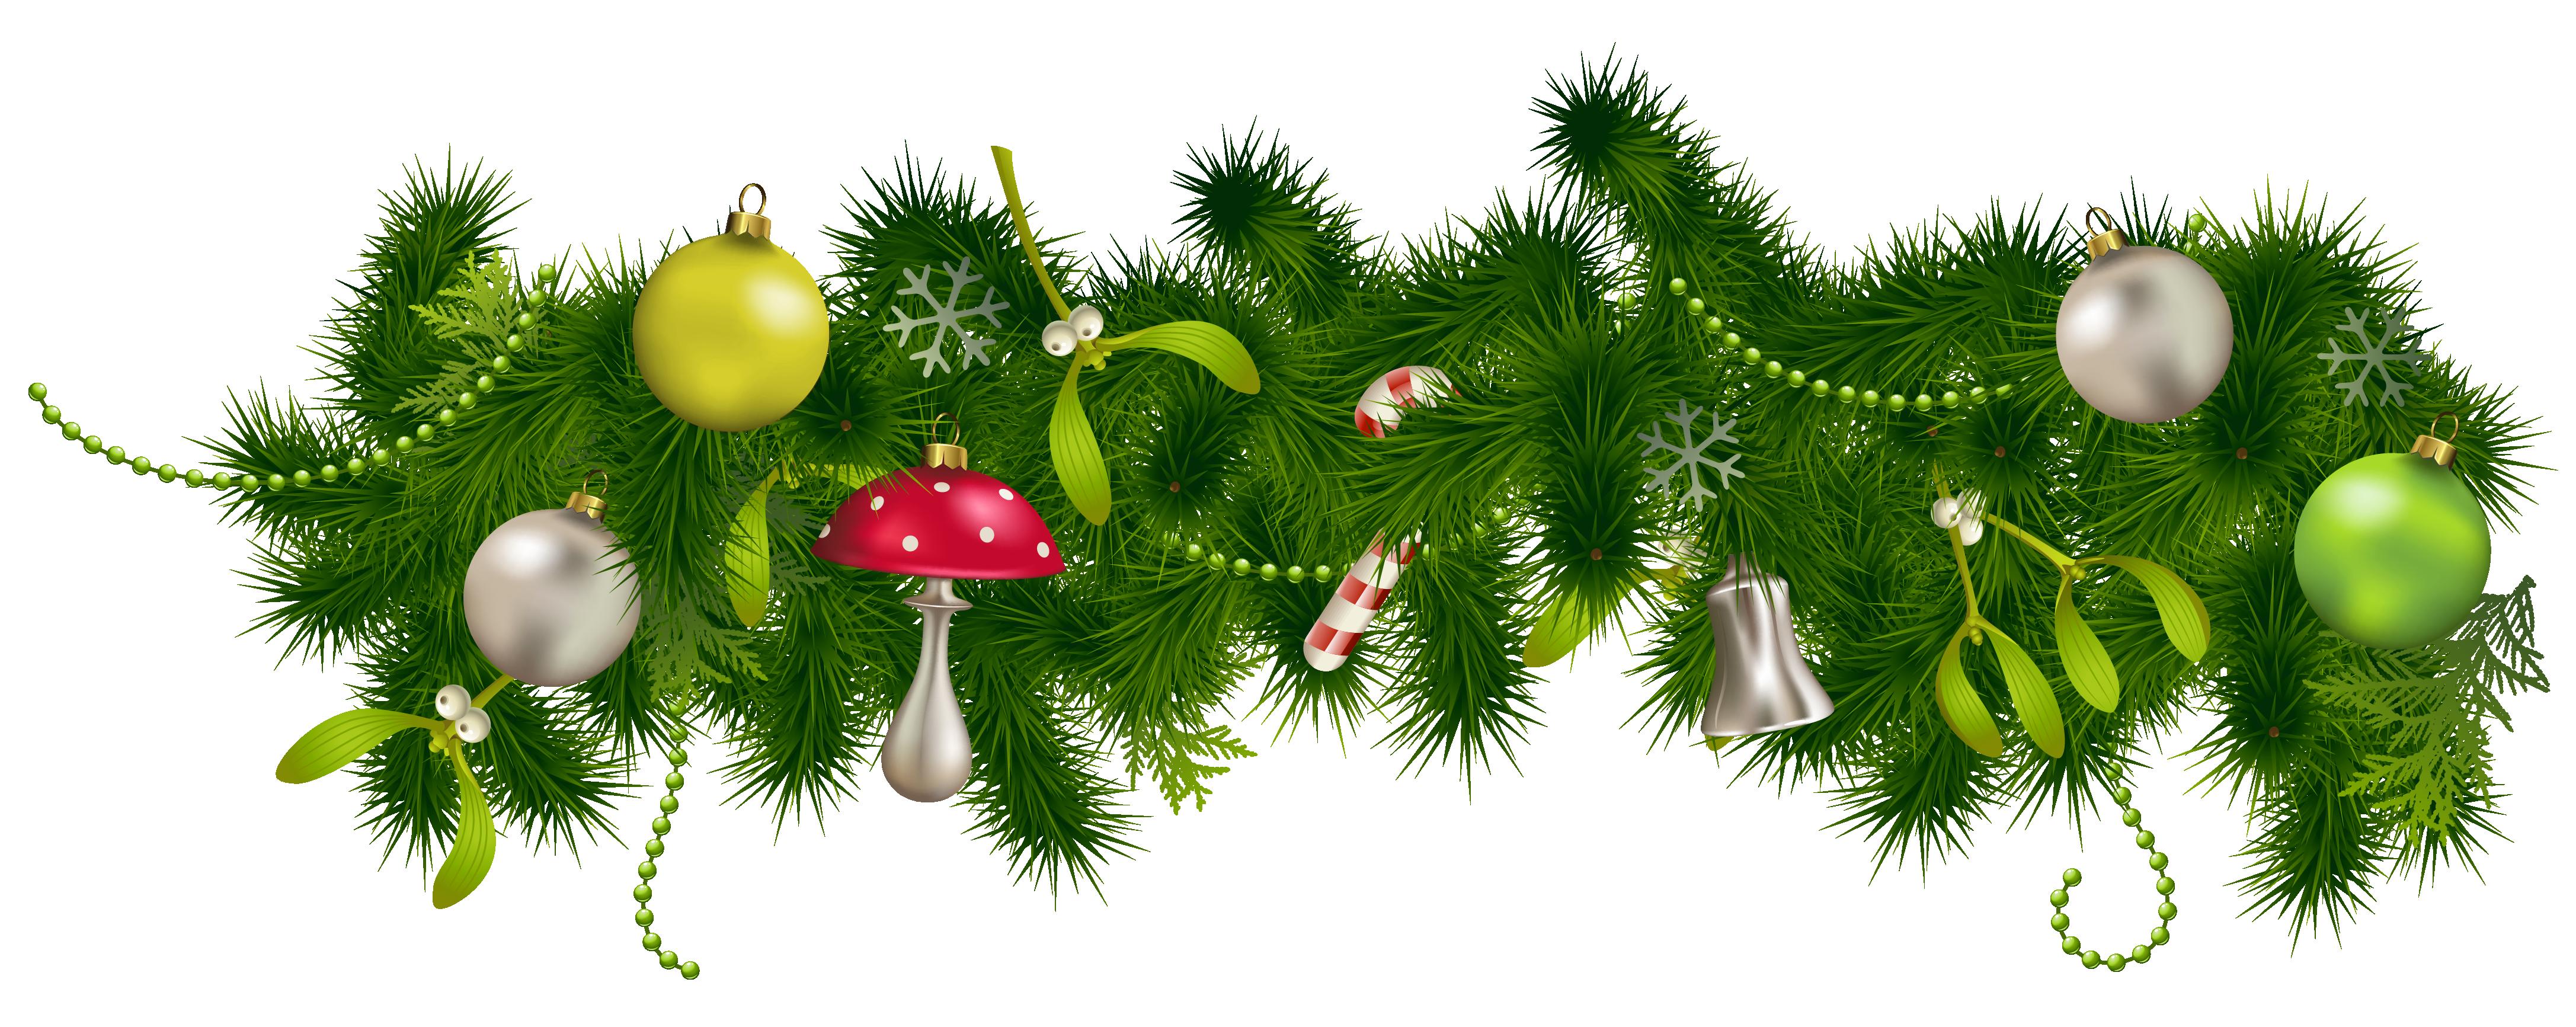 Garland clipart christmas tree garland. Xmas frames illustrations hd